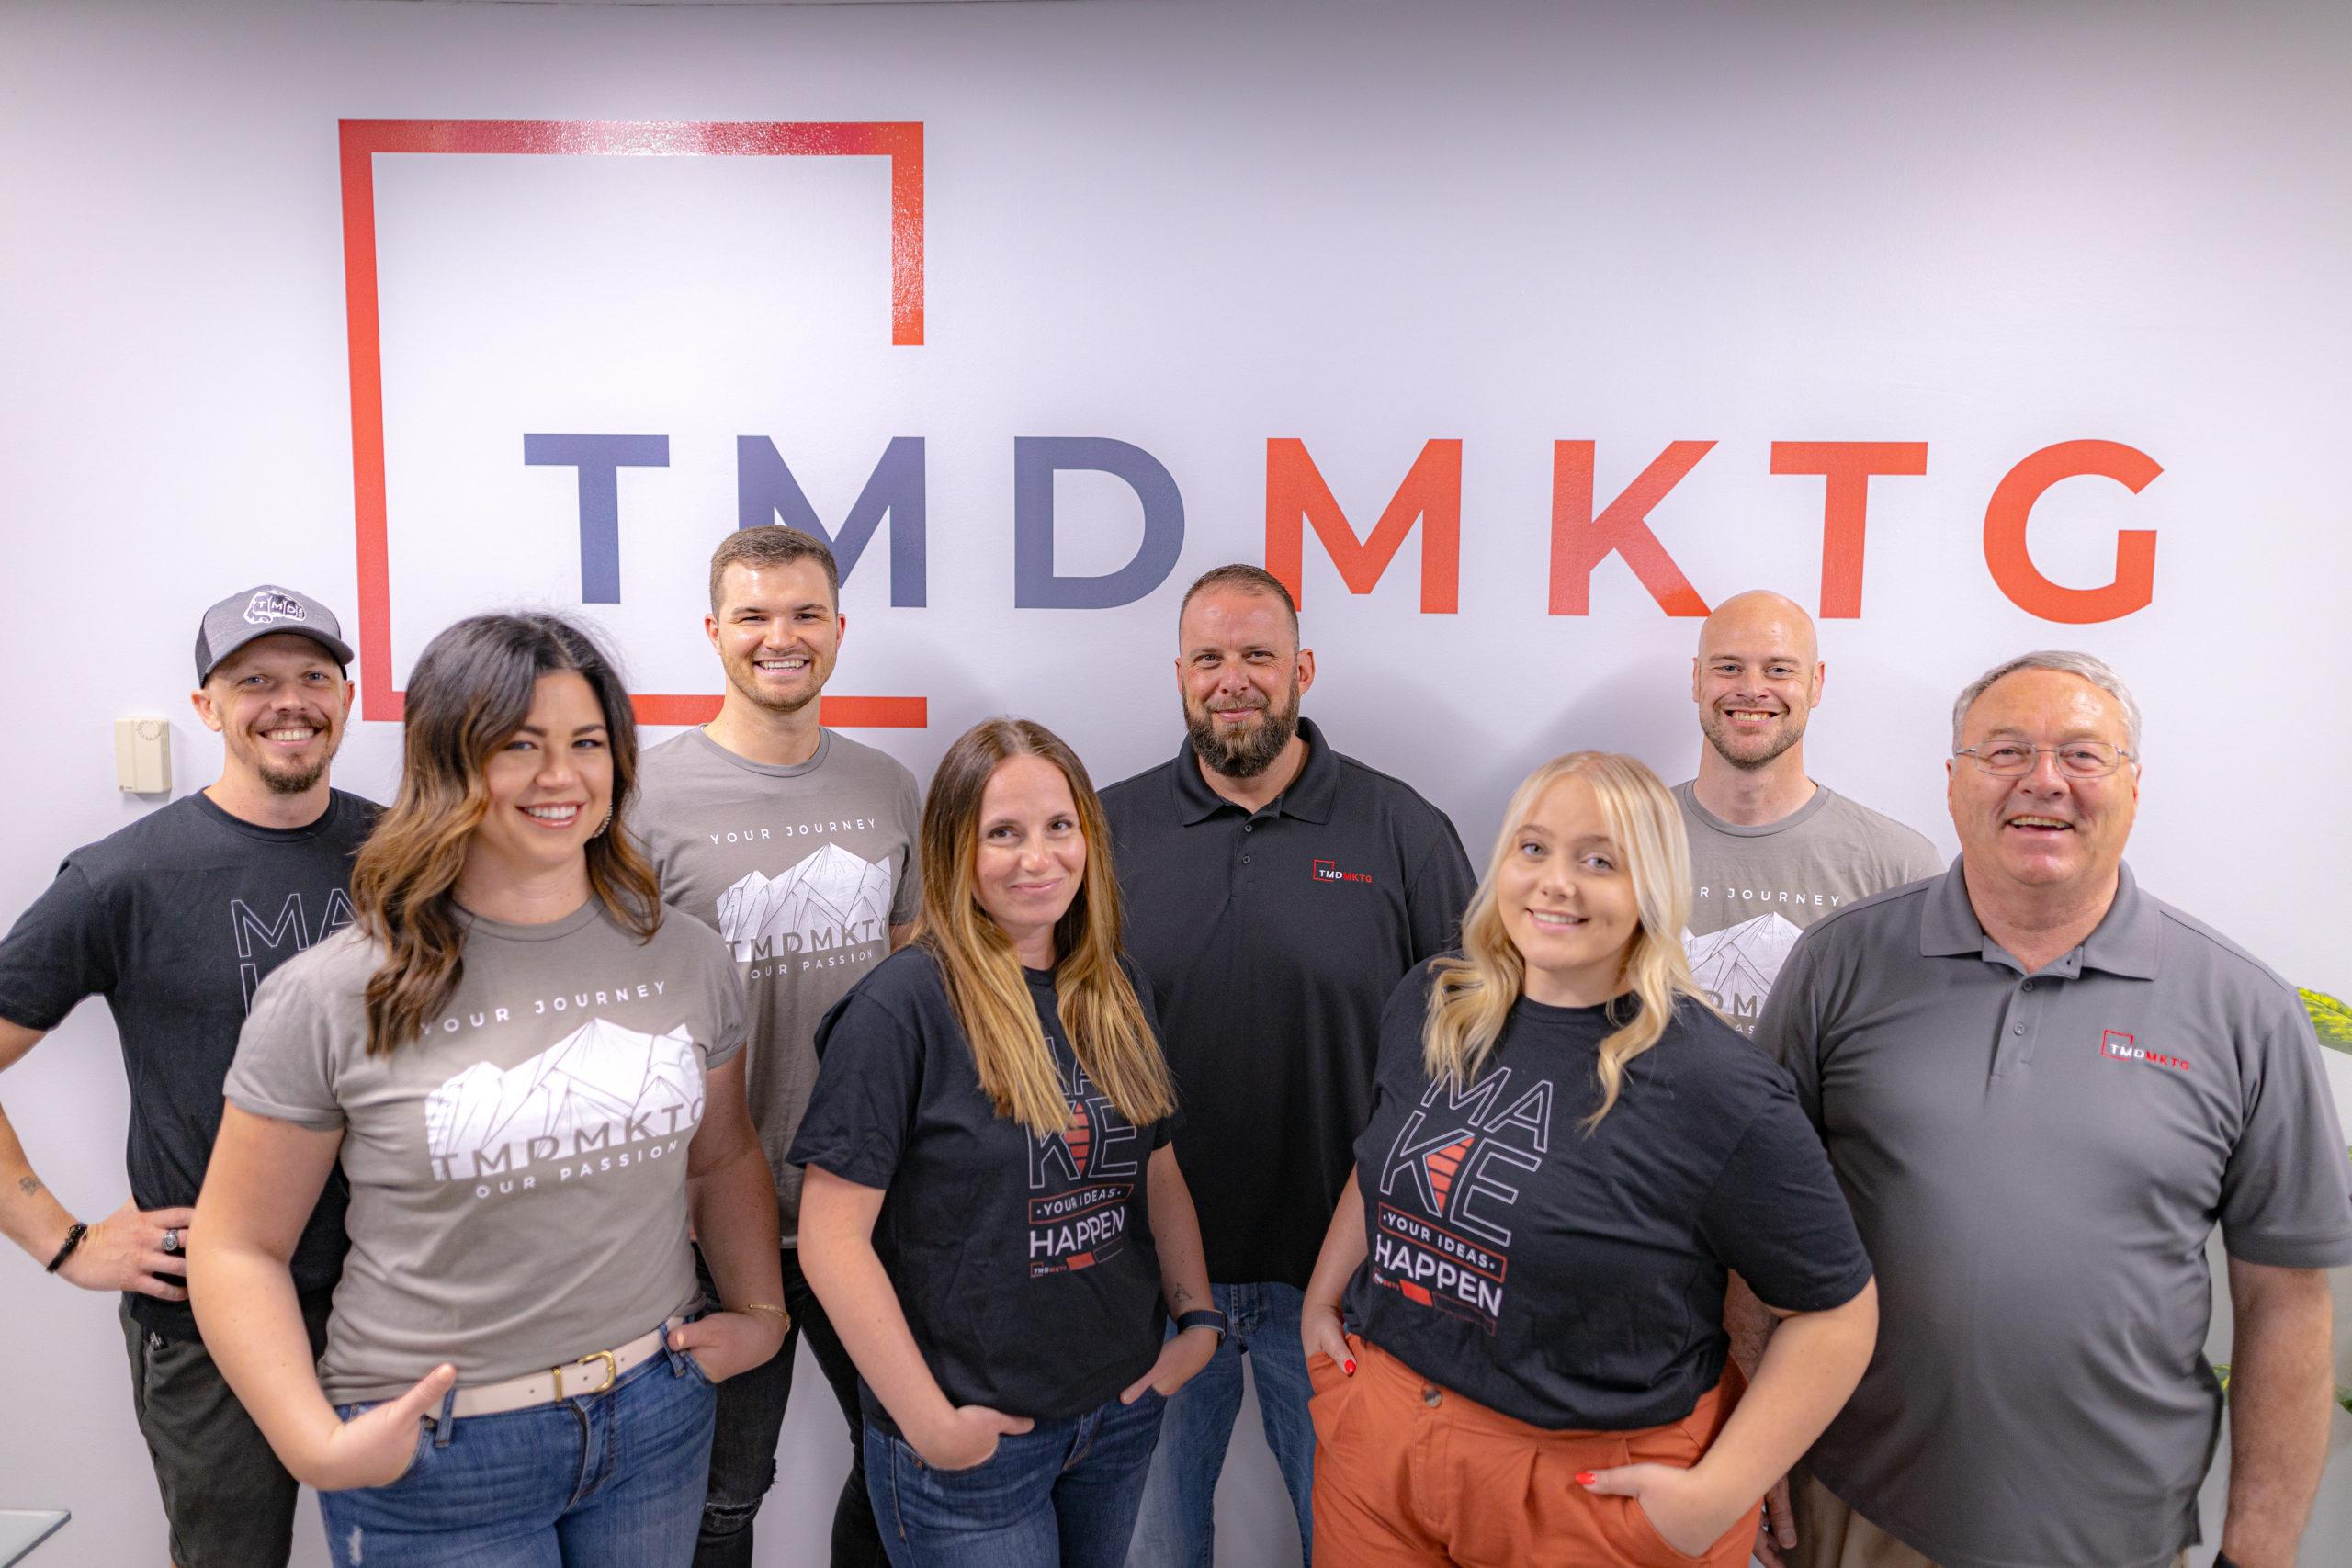 TMD Marketing